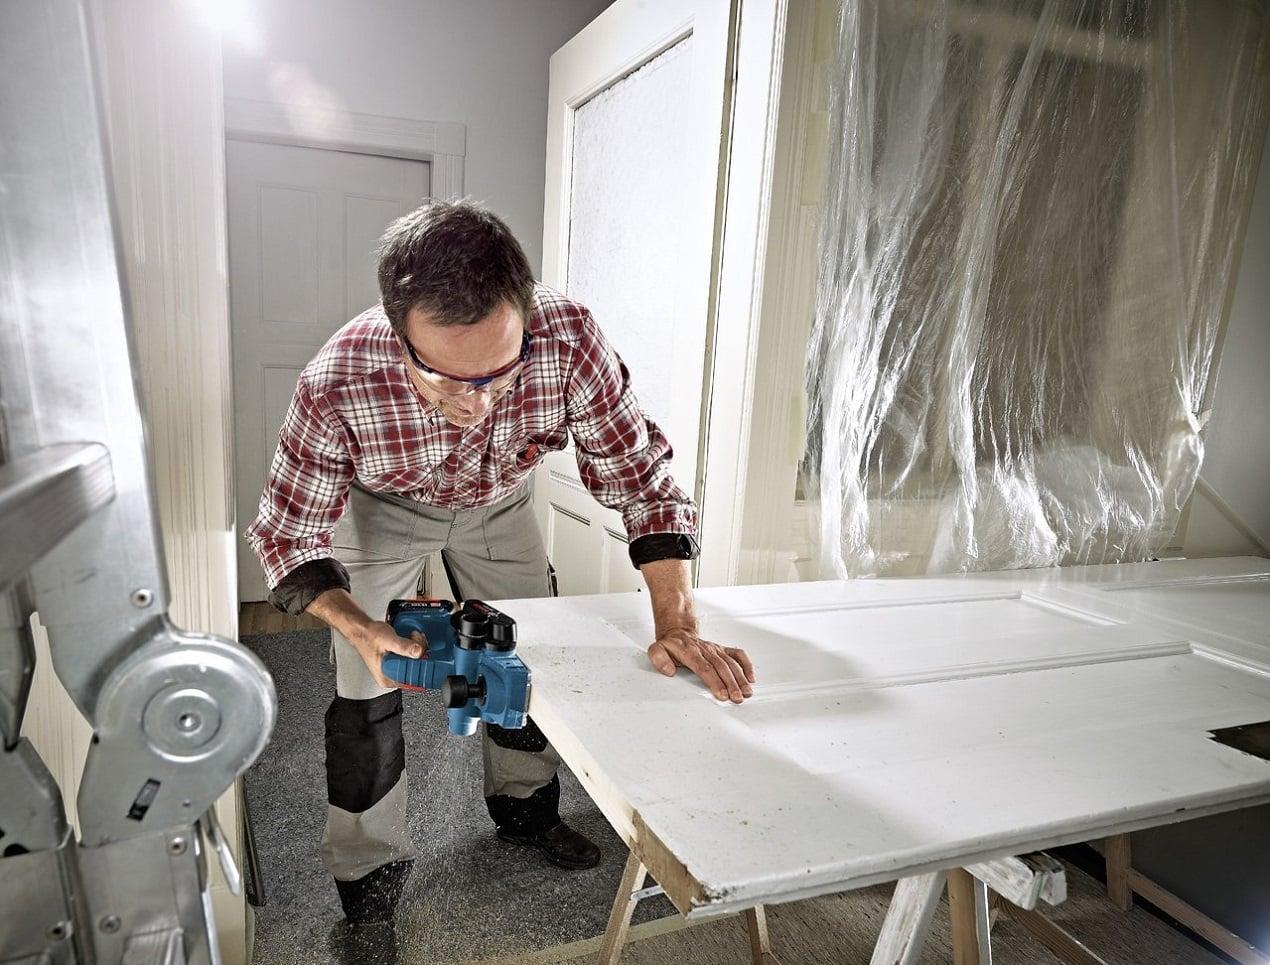 hobel akku bestseller 2018 elektro hobeln test die besten im vergleich im august 2018. Black Bedroom Furniture Sets. Home Design Ideas